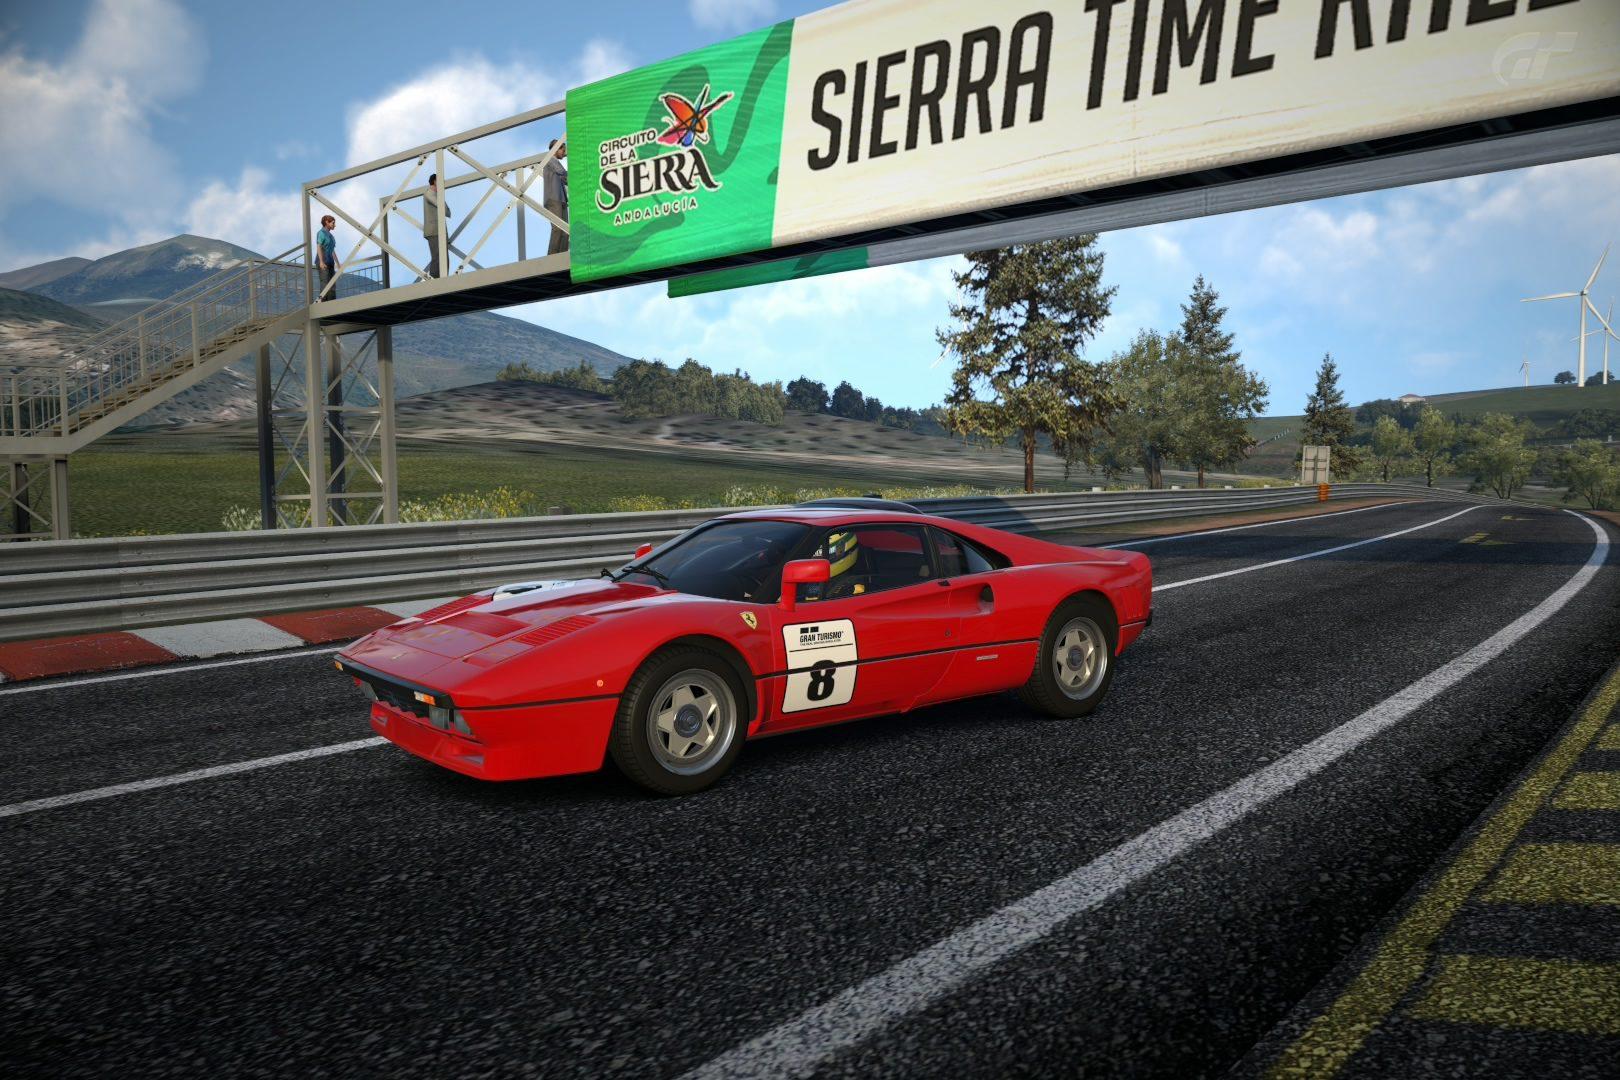 Circuito de la Sierra - Time Rally.jpg